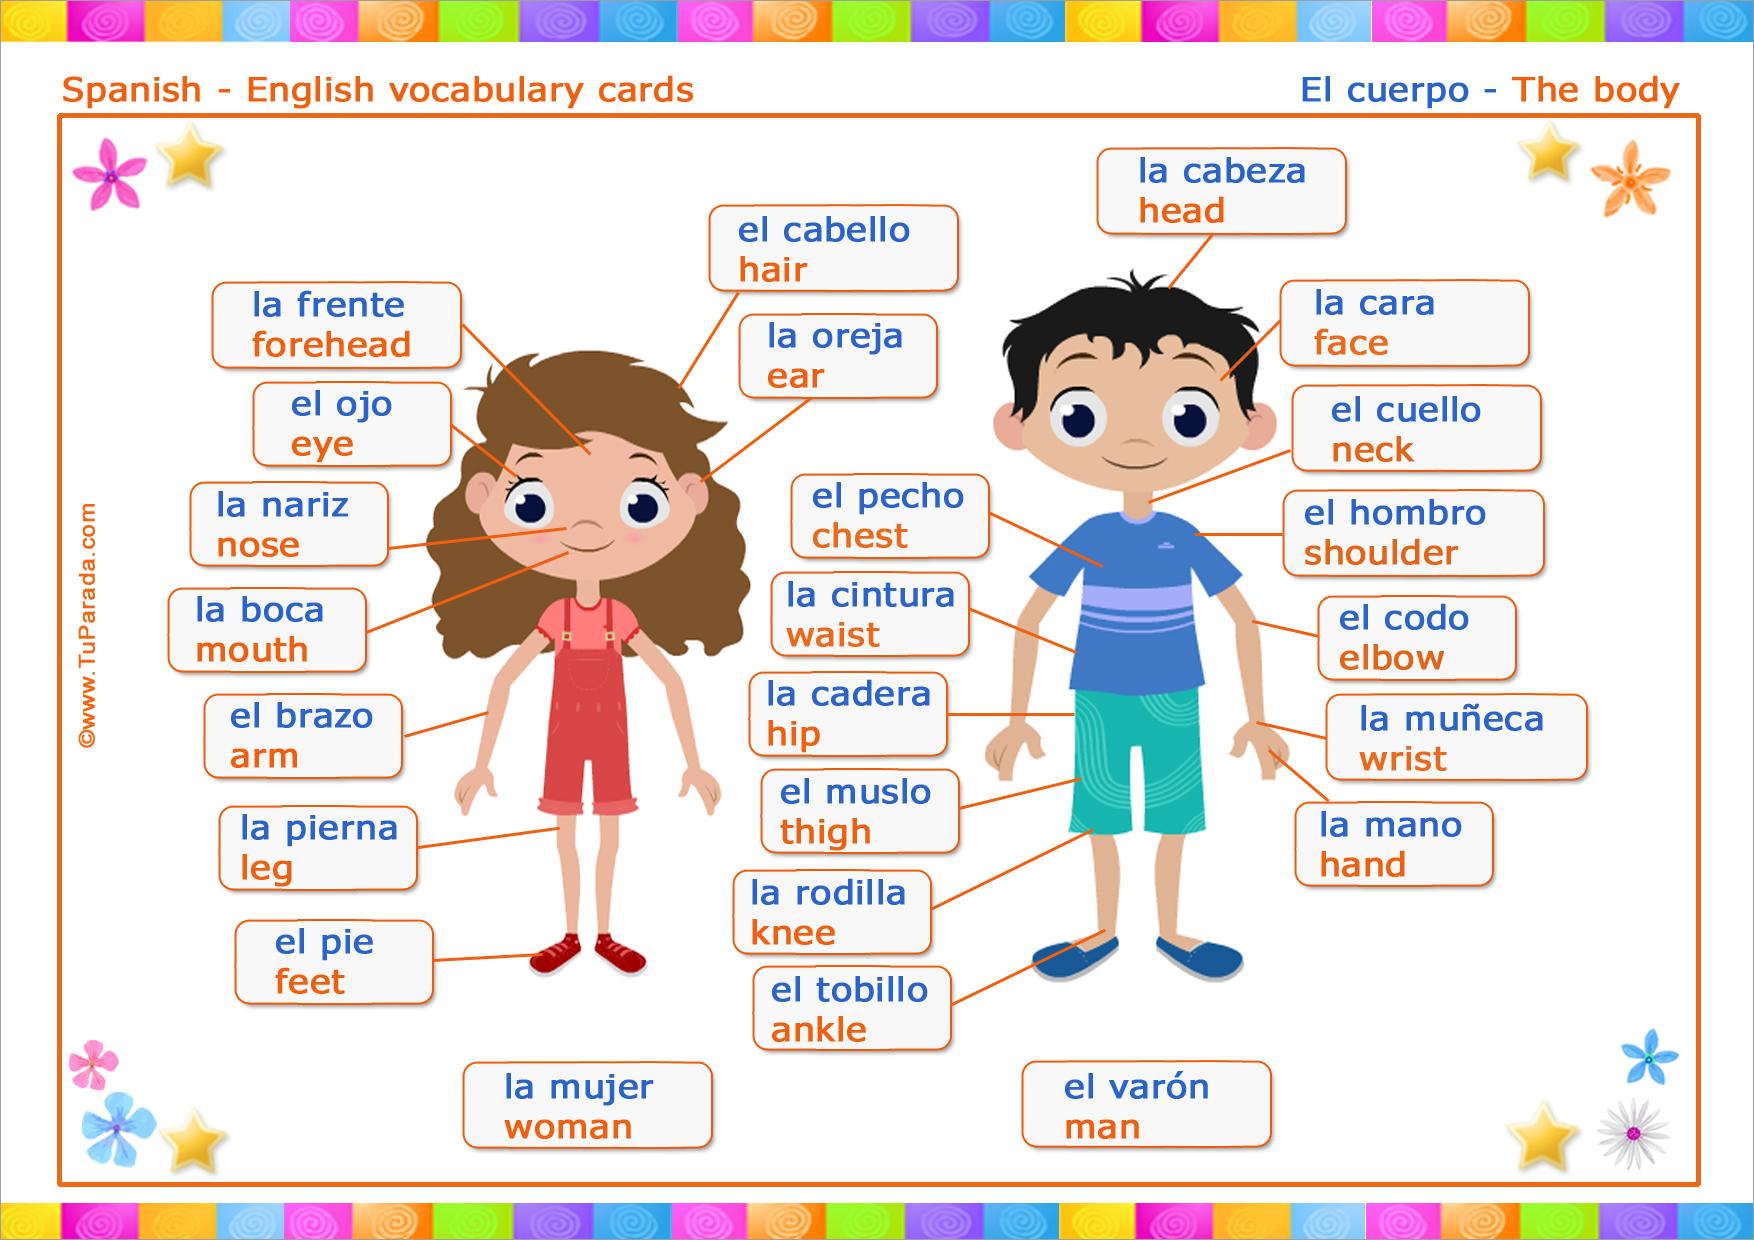 Tarjeta - Vocabulario: Cuerpo - Body